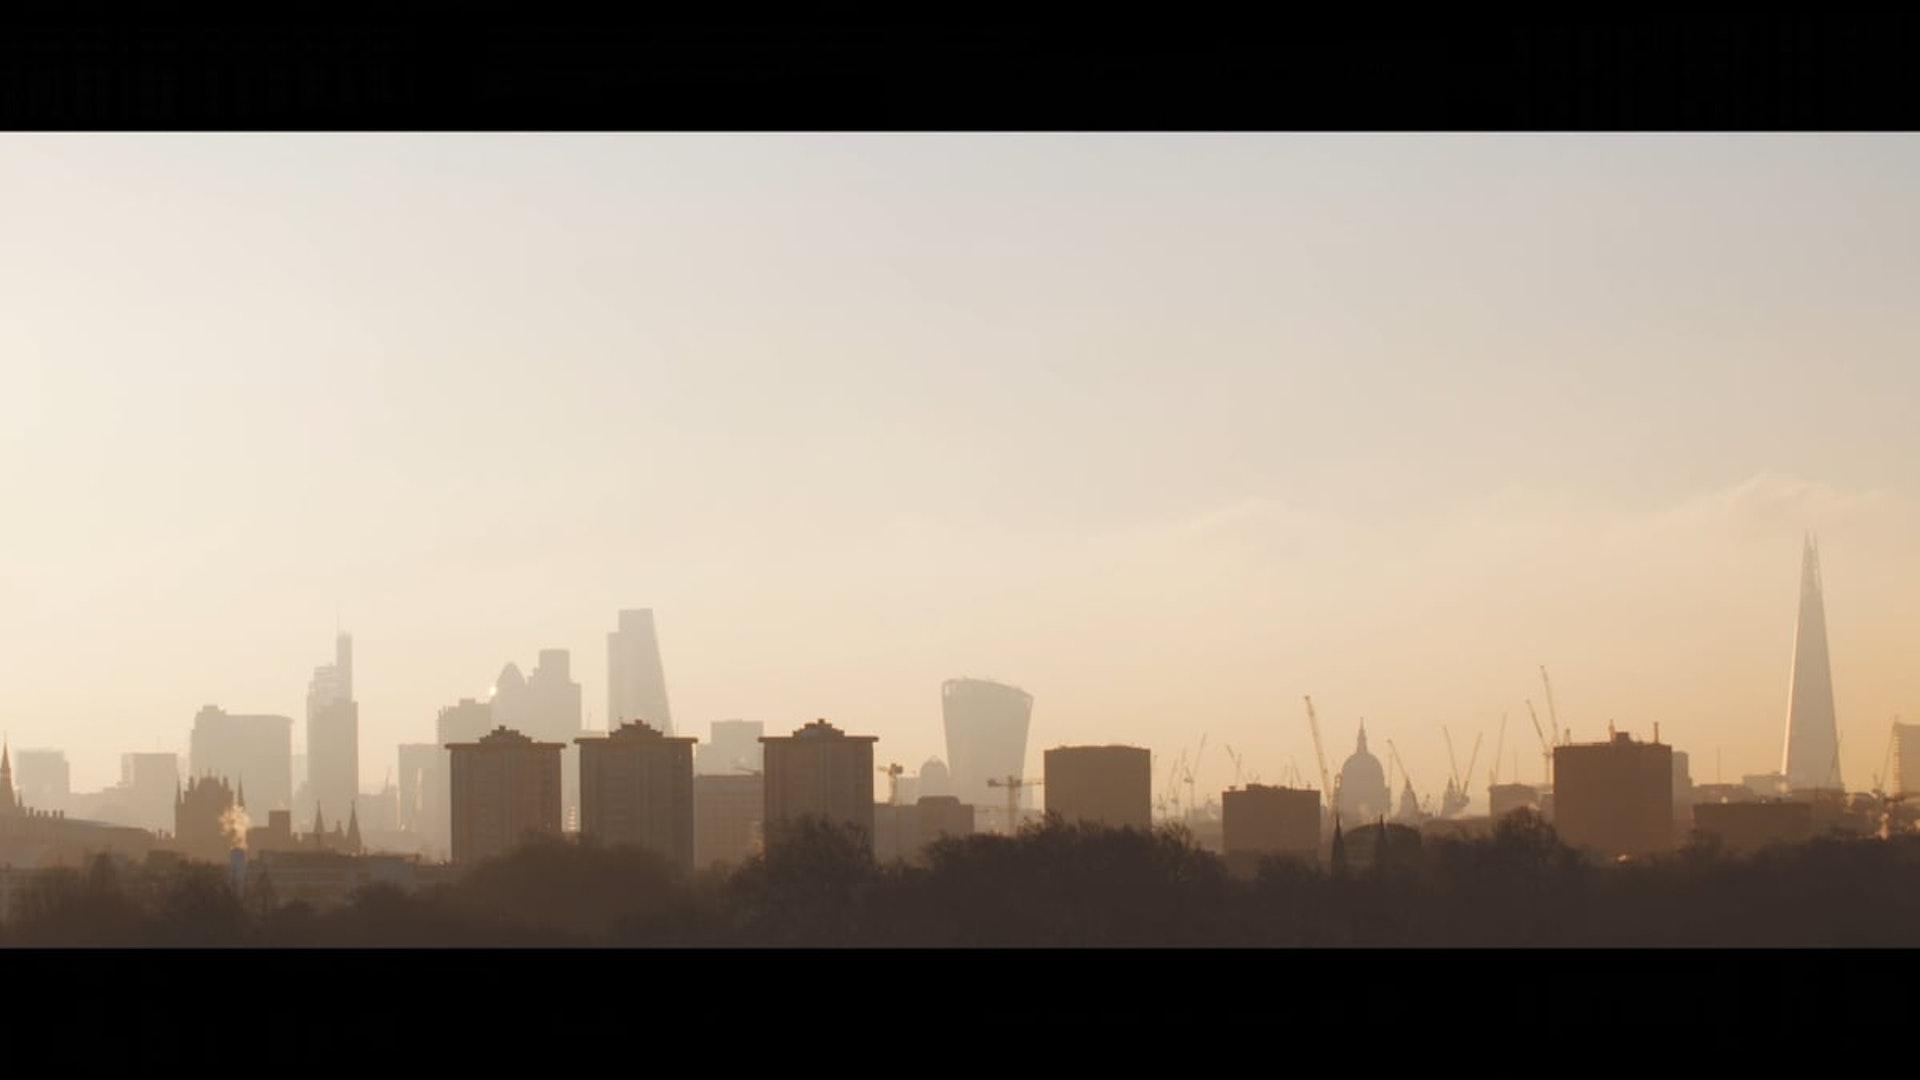 London Part ii (Short film)